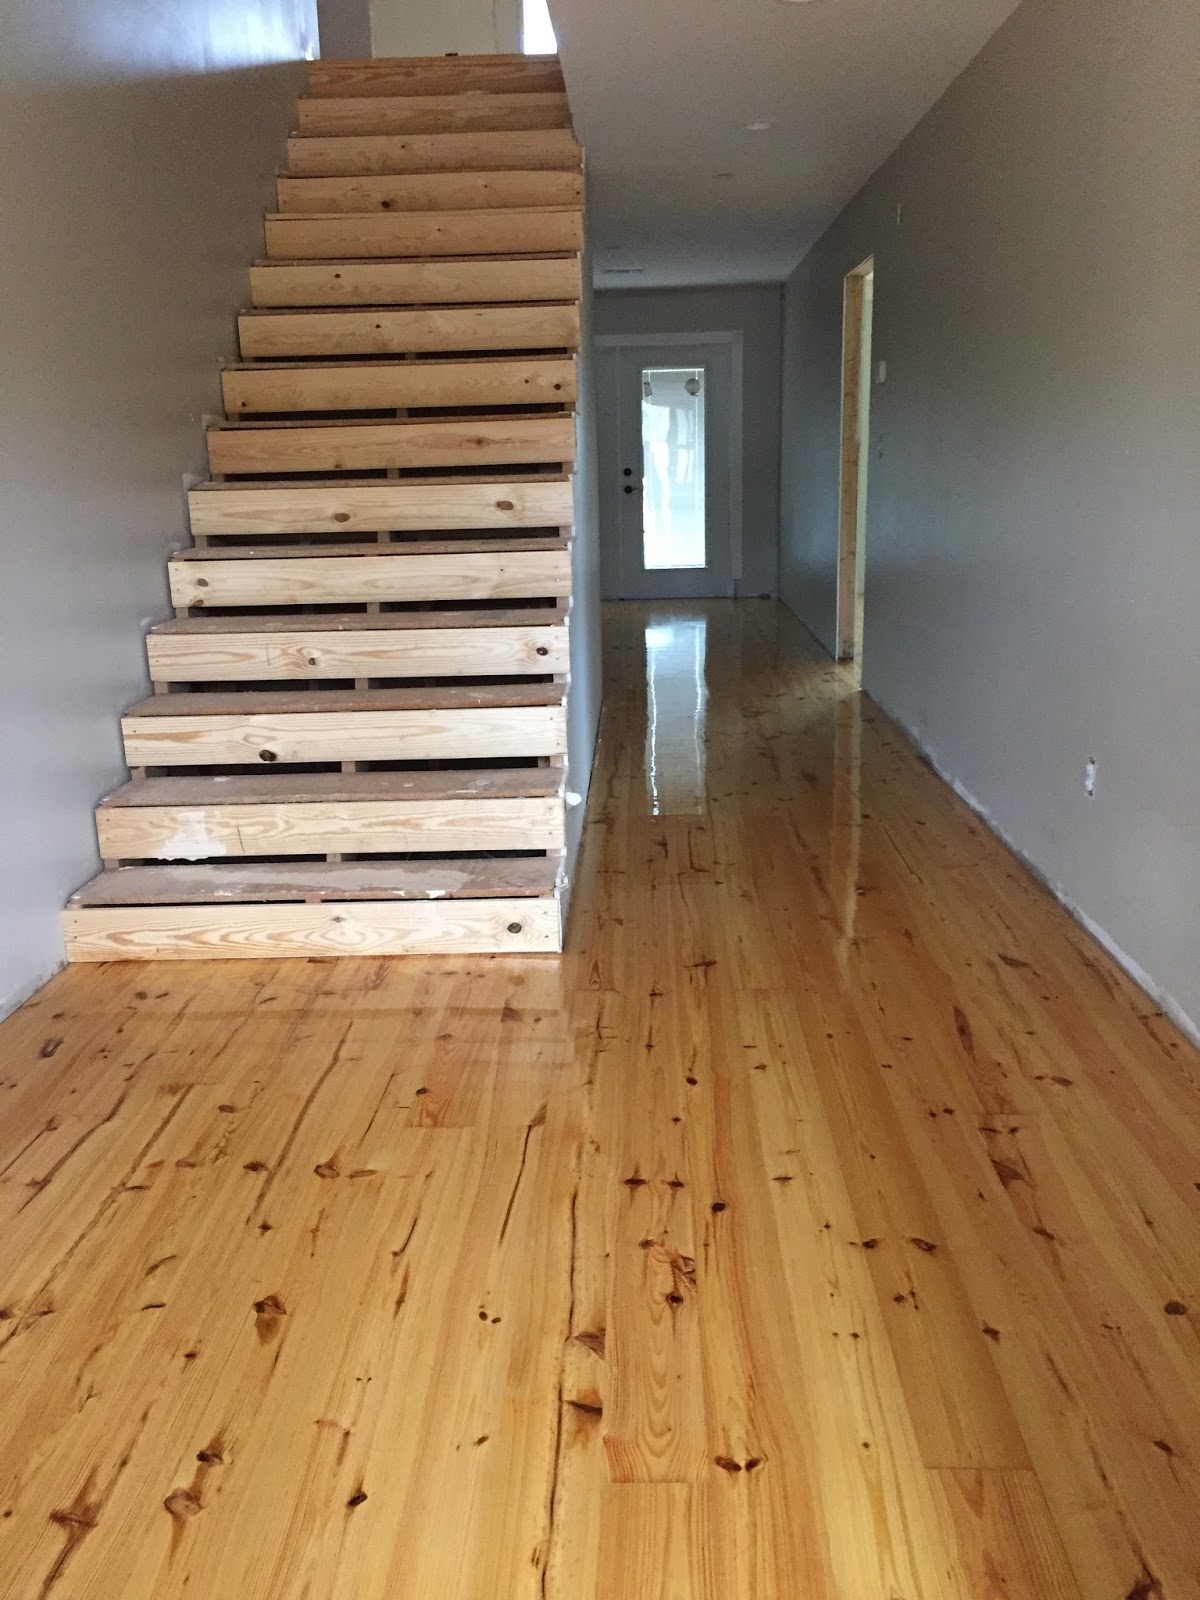 Oil Or Water Based Polyurethane Floor Finish